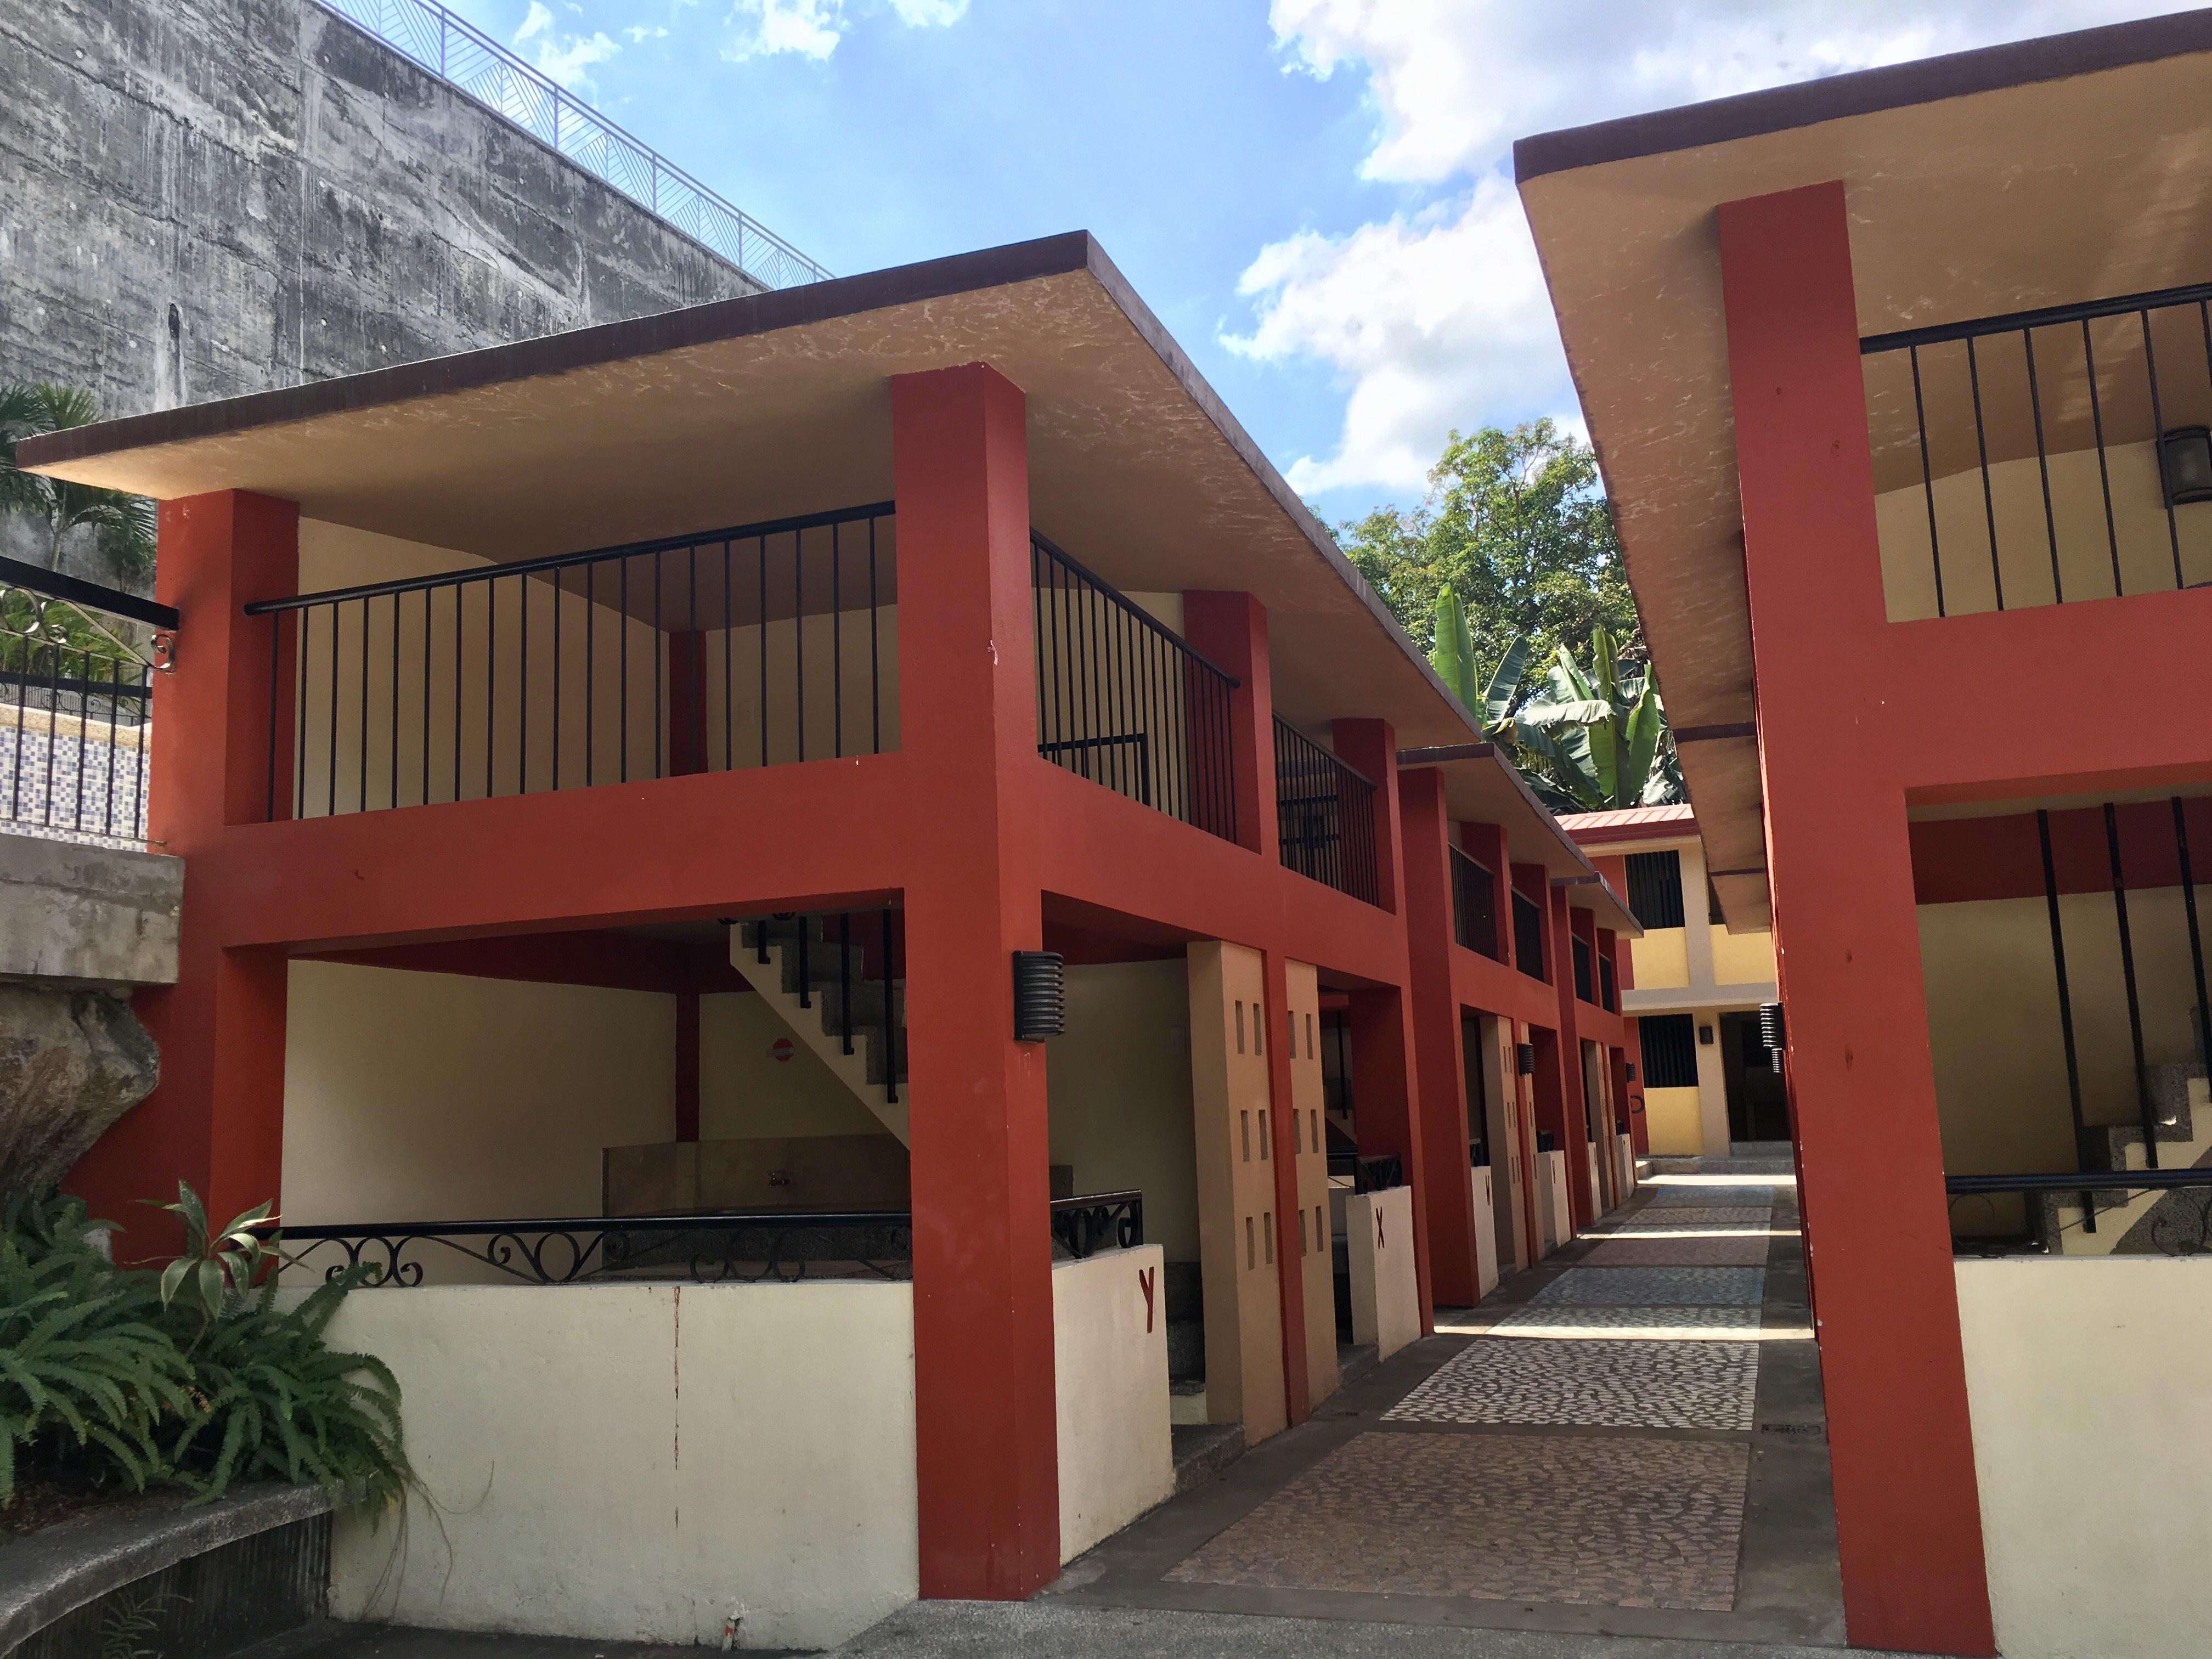 Casa with Loft small